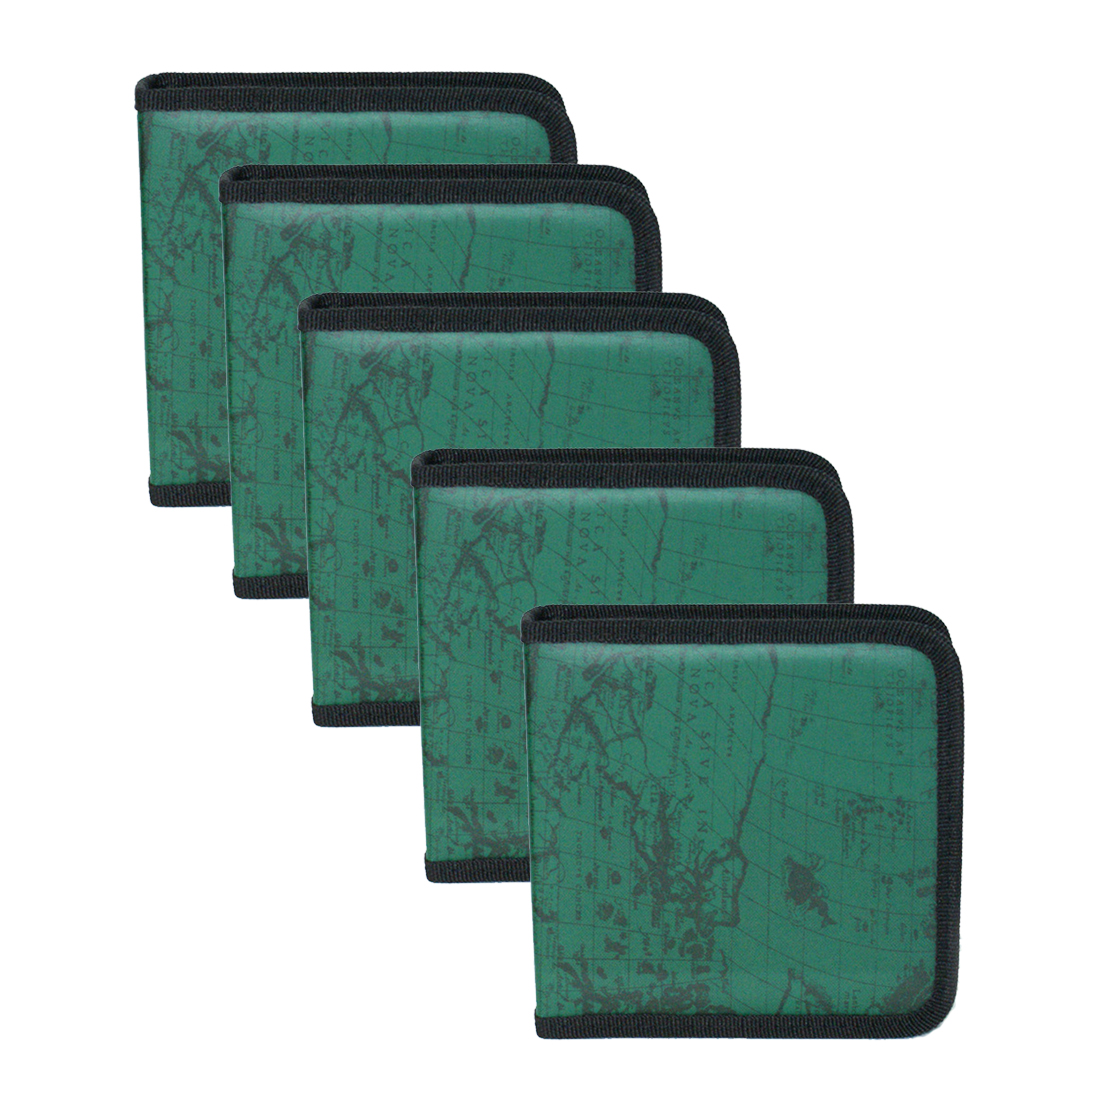 40 CD DVD Disc Storage Holder Carry Case Organizer Sleeve Wallet Cover Bag Box DVD Storage Album CD Box Bags Cases